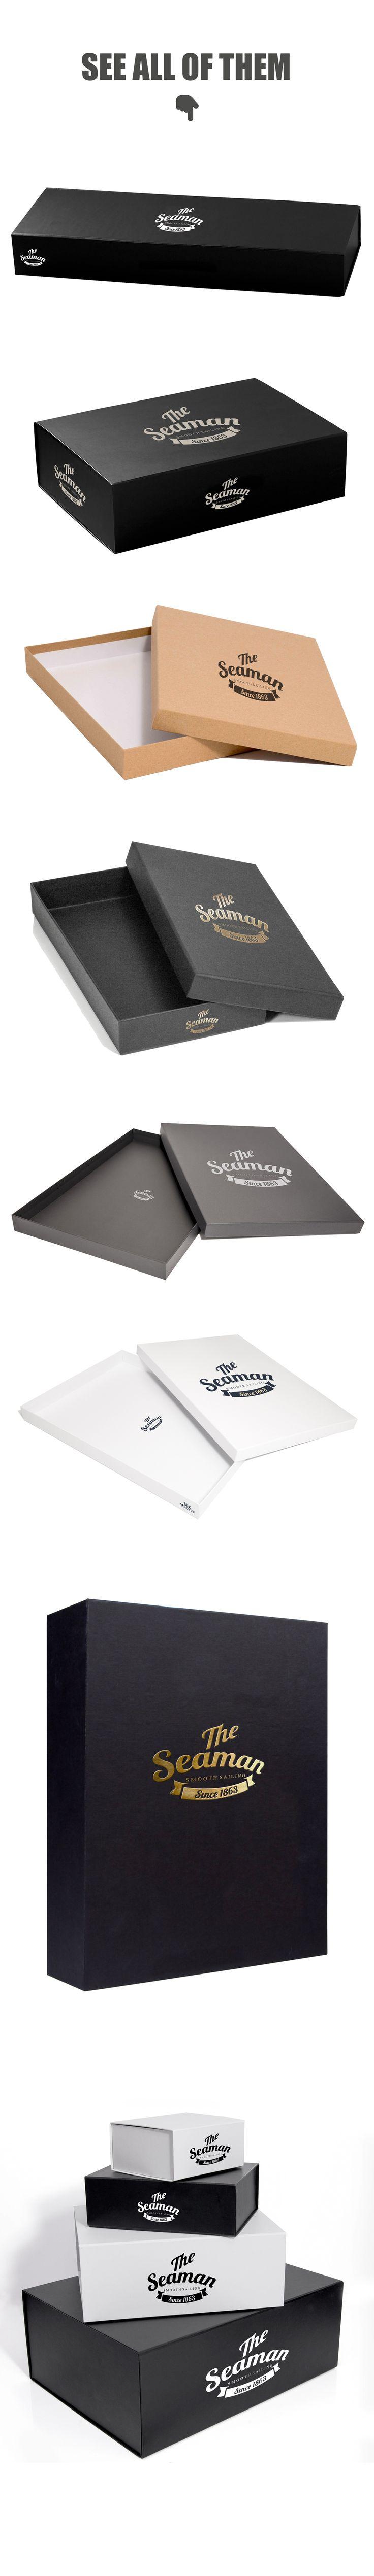 White apron mockup free - 8 Elegant Box Mockups By Limedot On Creative Market